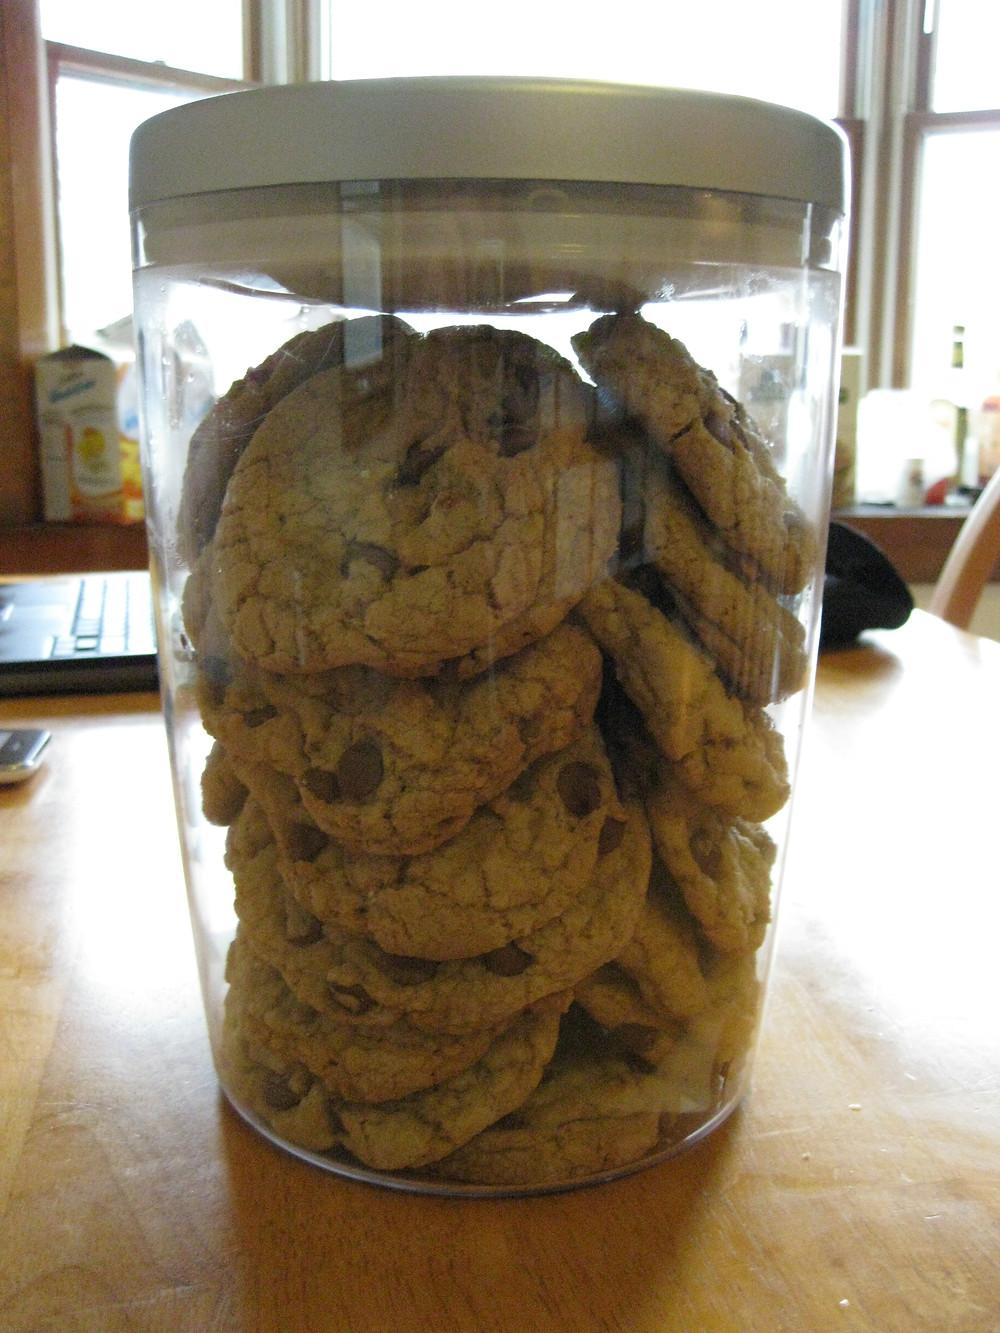 "Clutter-Free Ways to Celebrate Valentine's Day - ""Cookie Jar"" by Scott Rubin is licensed under CC BY 2.0"